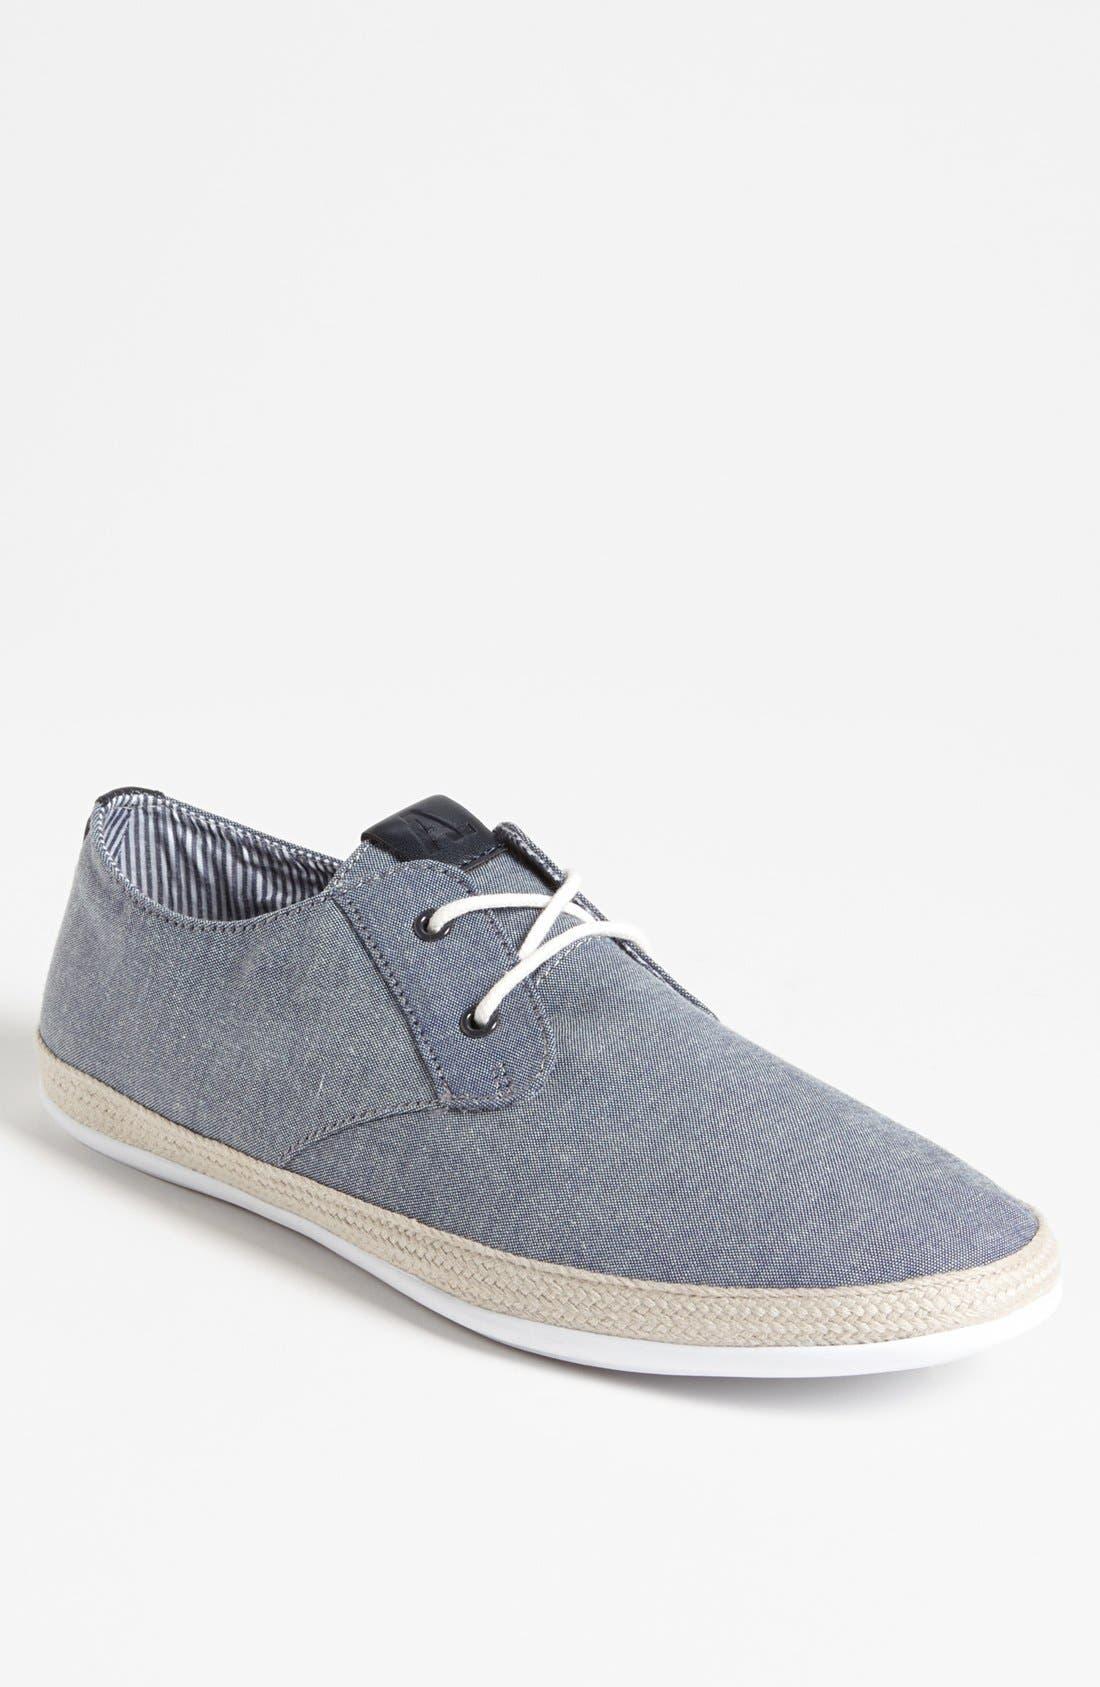 Alternate Image 1 Selected - ALDO 'Stein' Sneaker